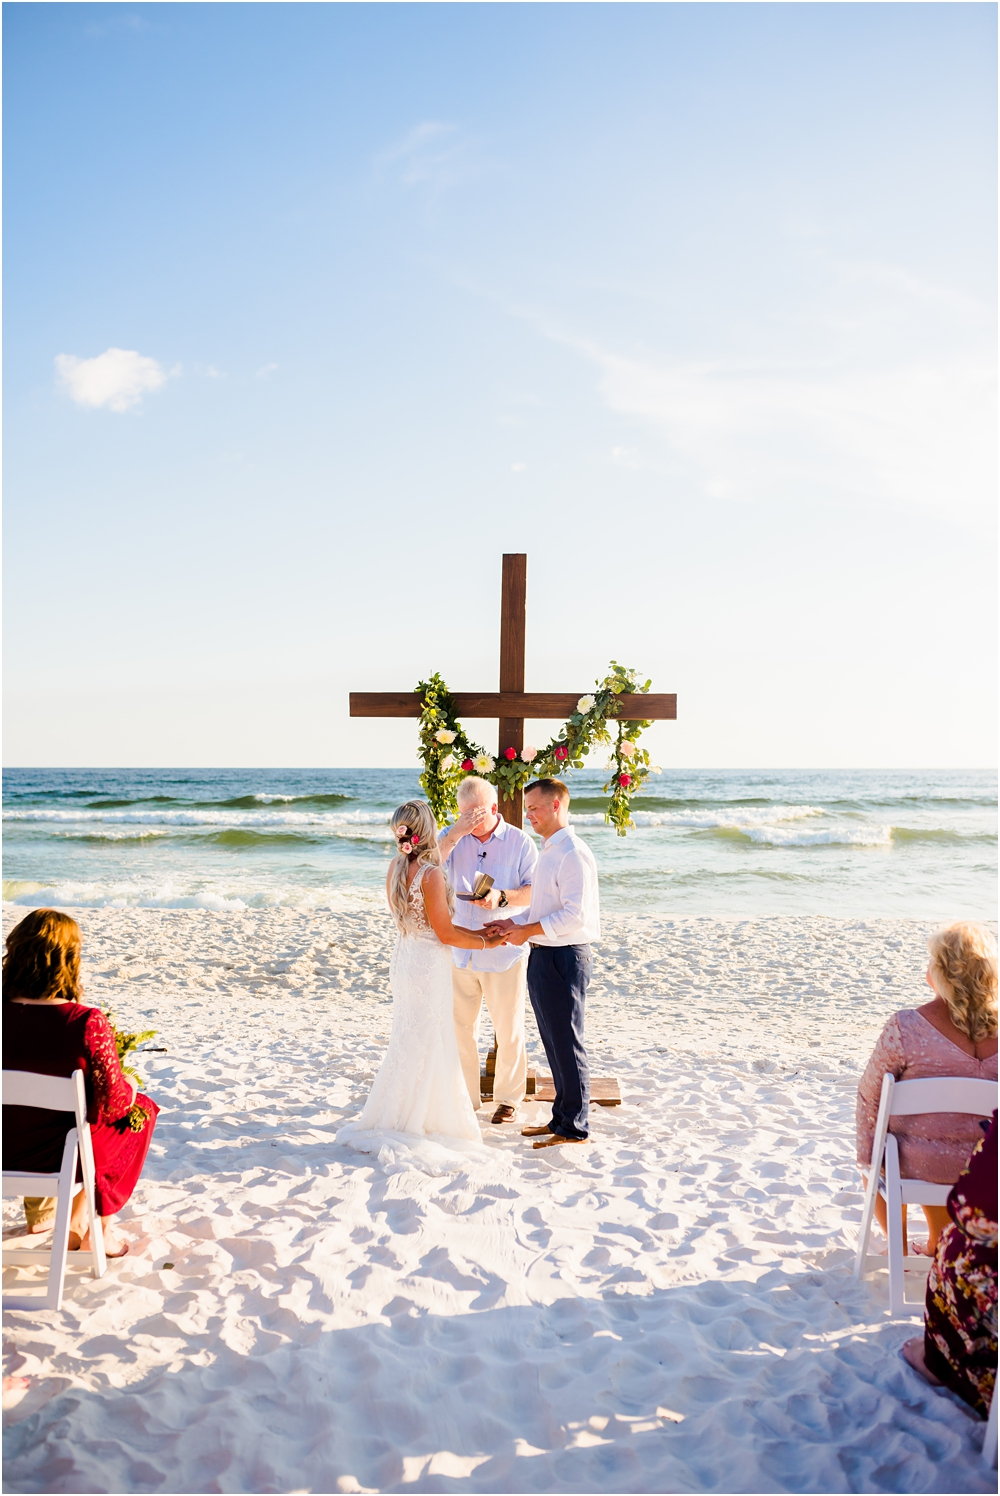 mcglothlin-wedding-kiersten-stevenson-photography-30a-panama-city-beach-dothan-tallahassee-(88-of-145).jpg